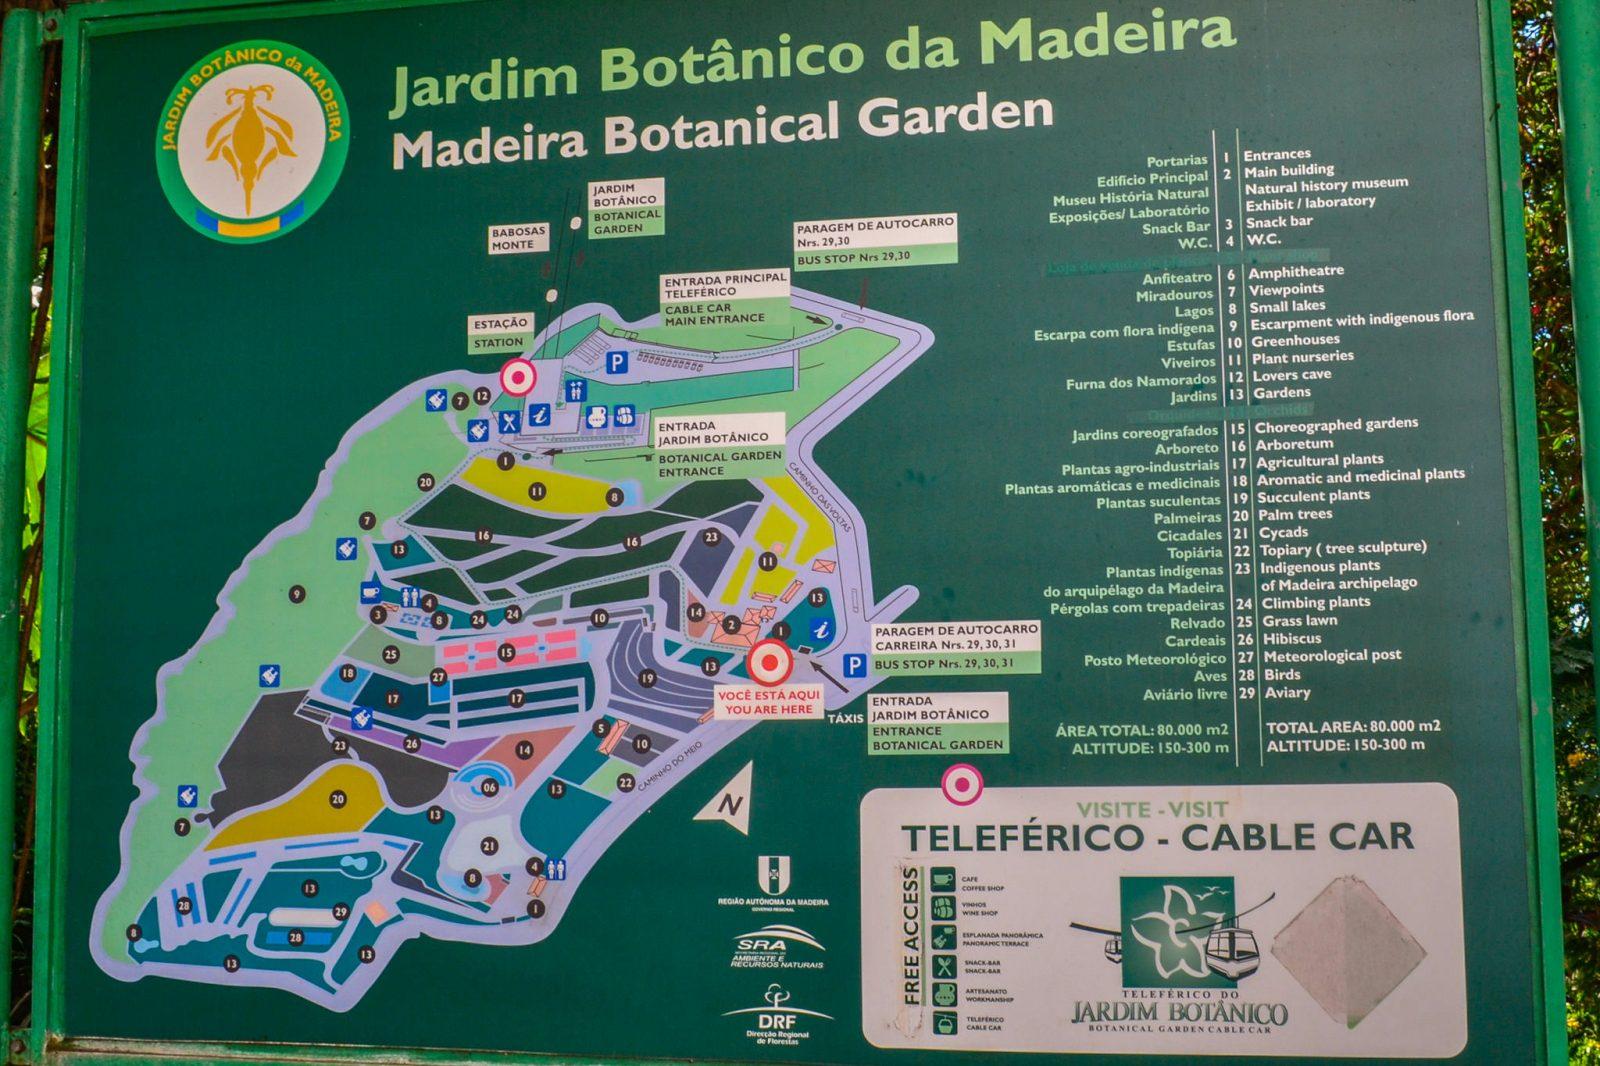 Схема ботанического сада Мадейры